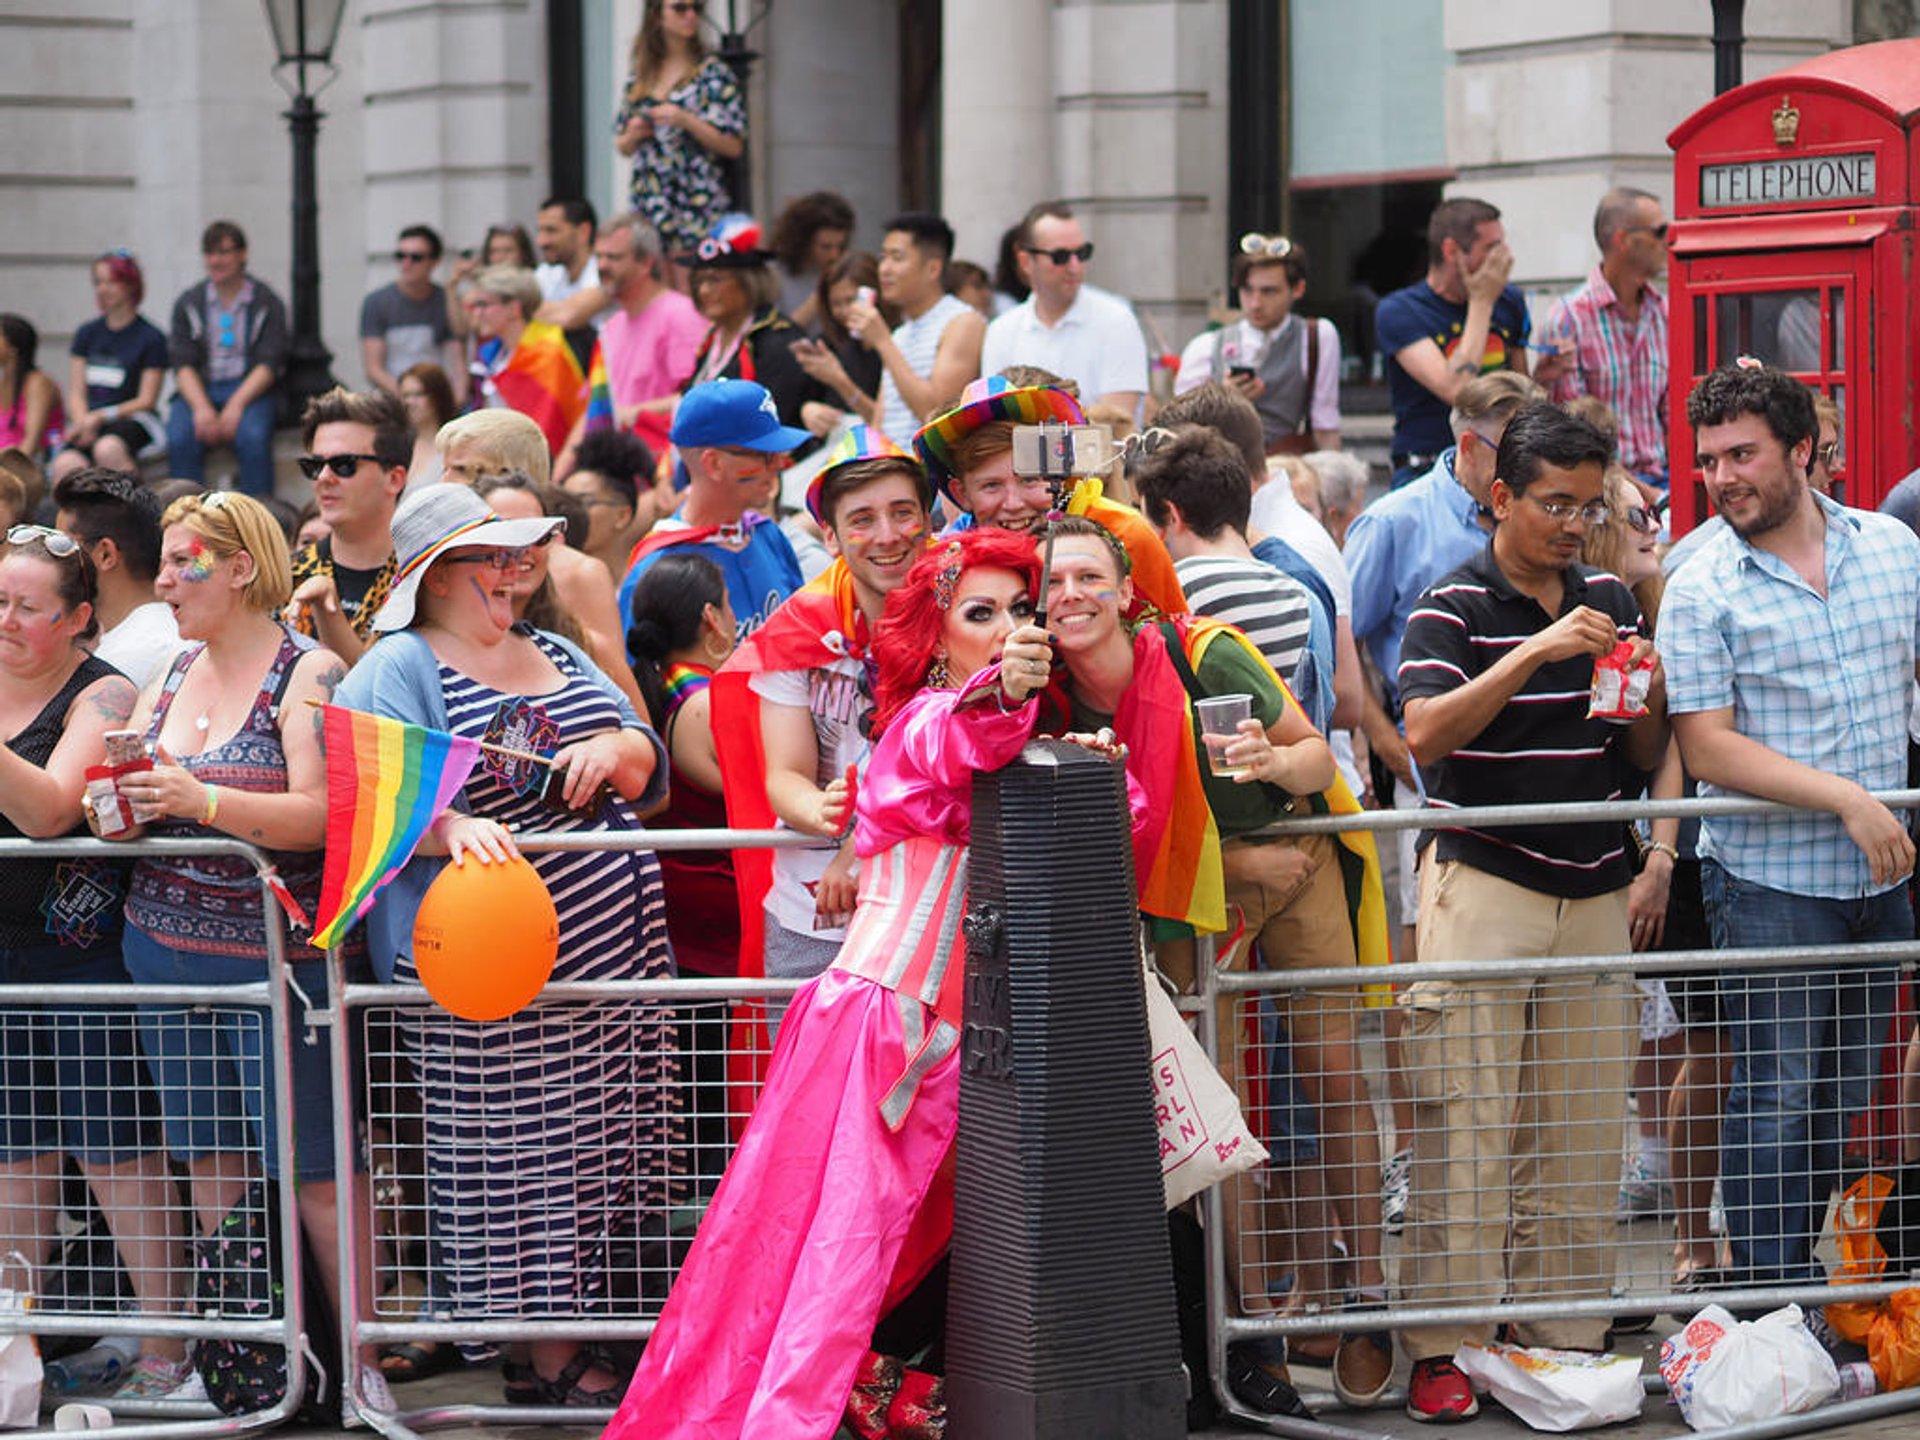 Pride in London Parade in London - Best Season 2020